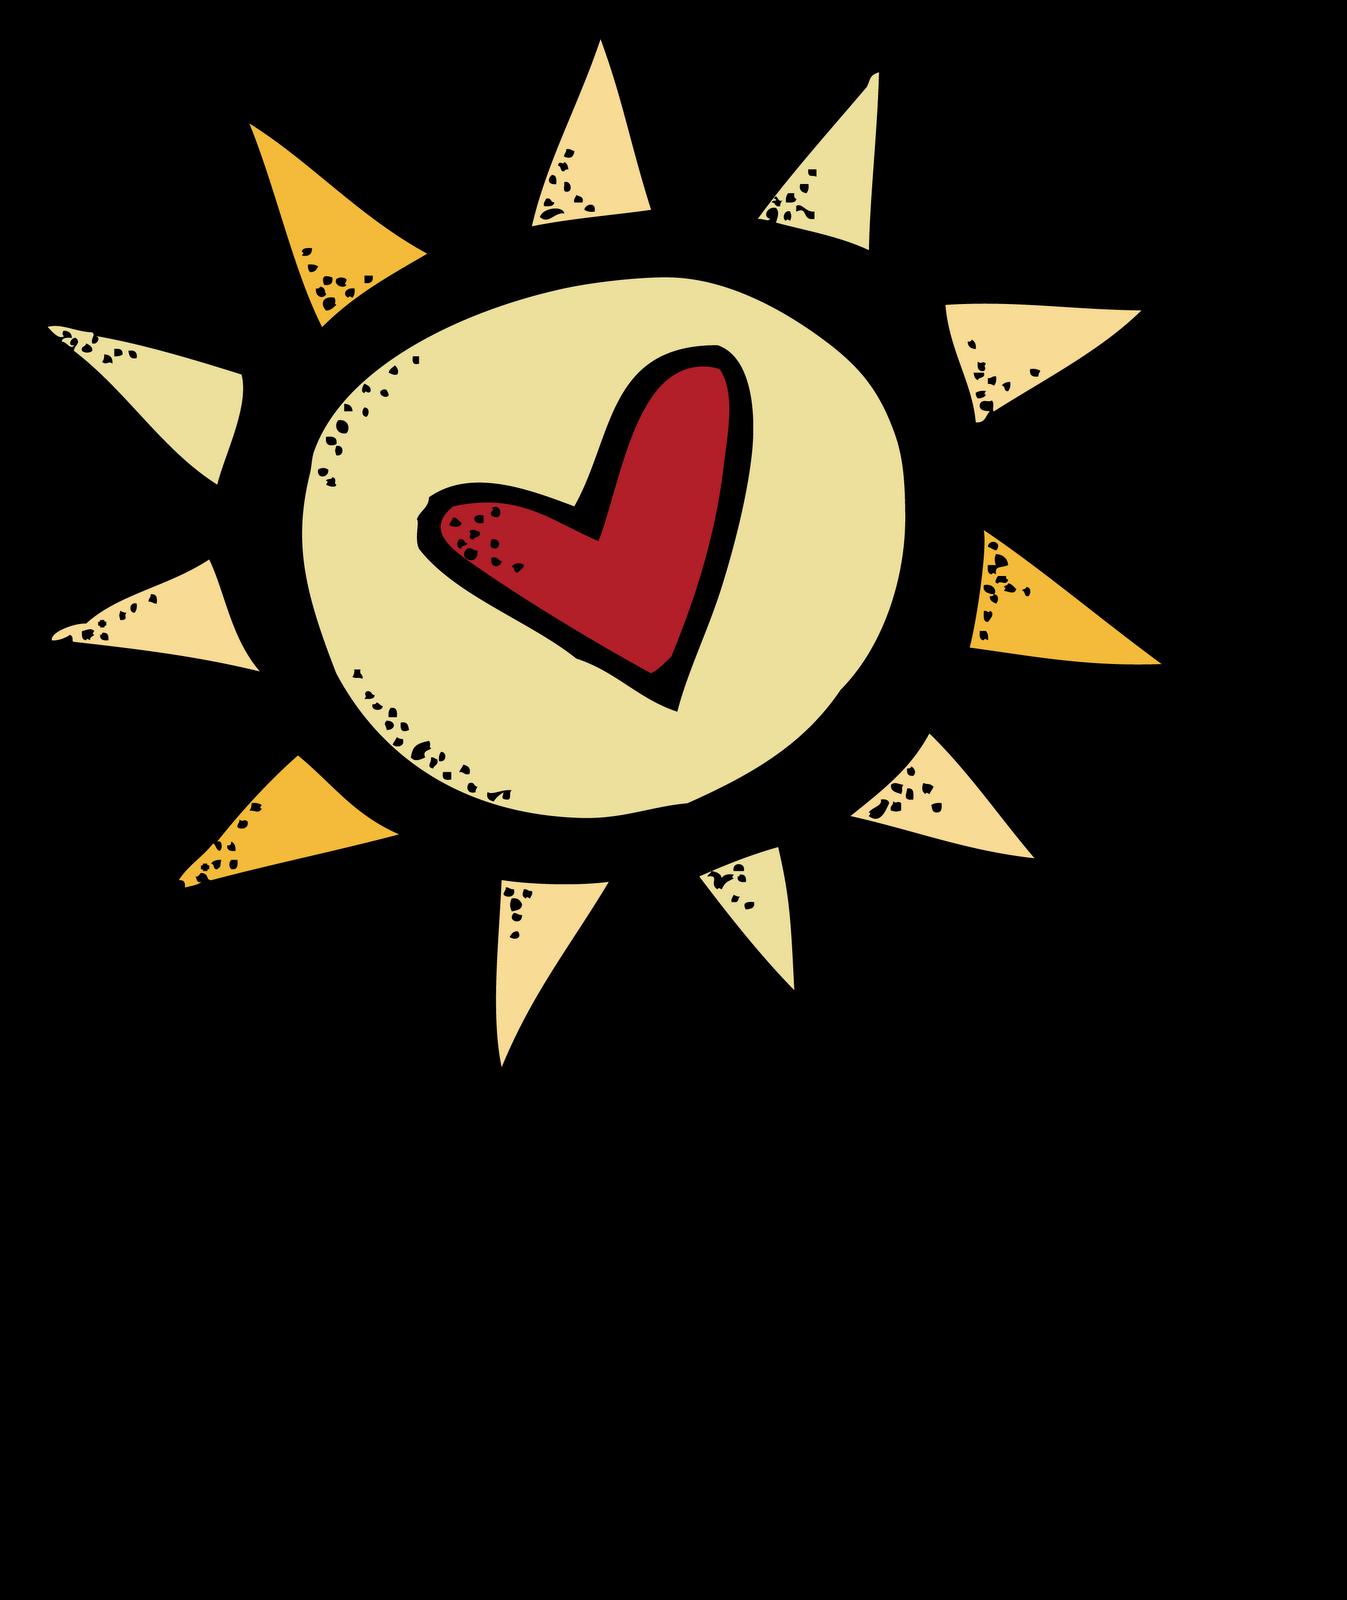 Clipart sunshine word art. Melonheadz lds illustrating in